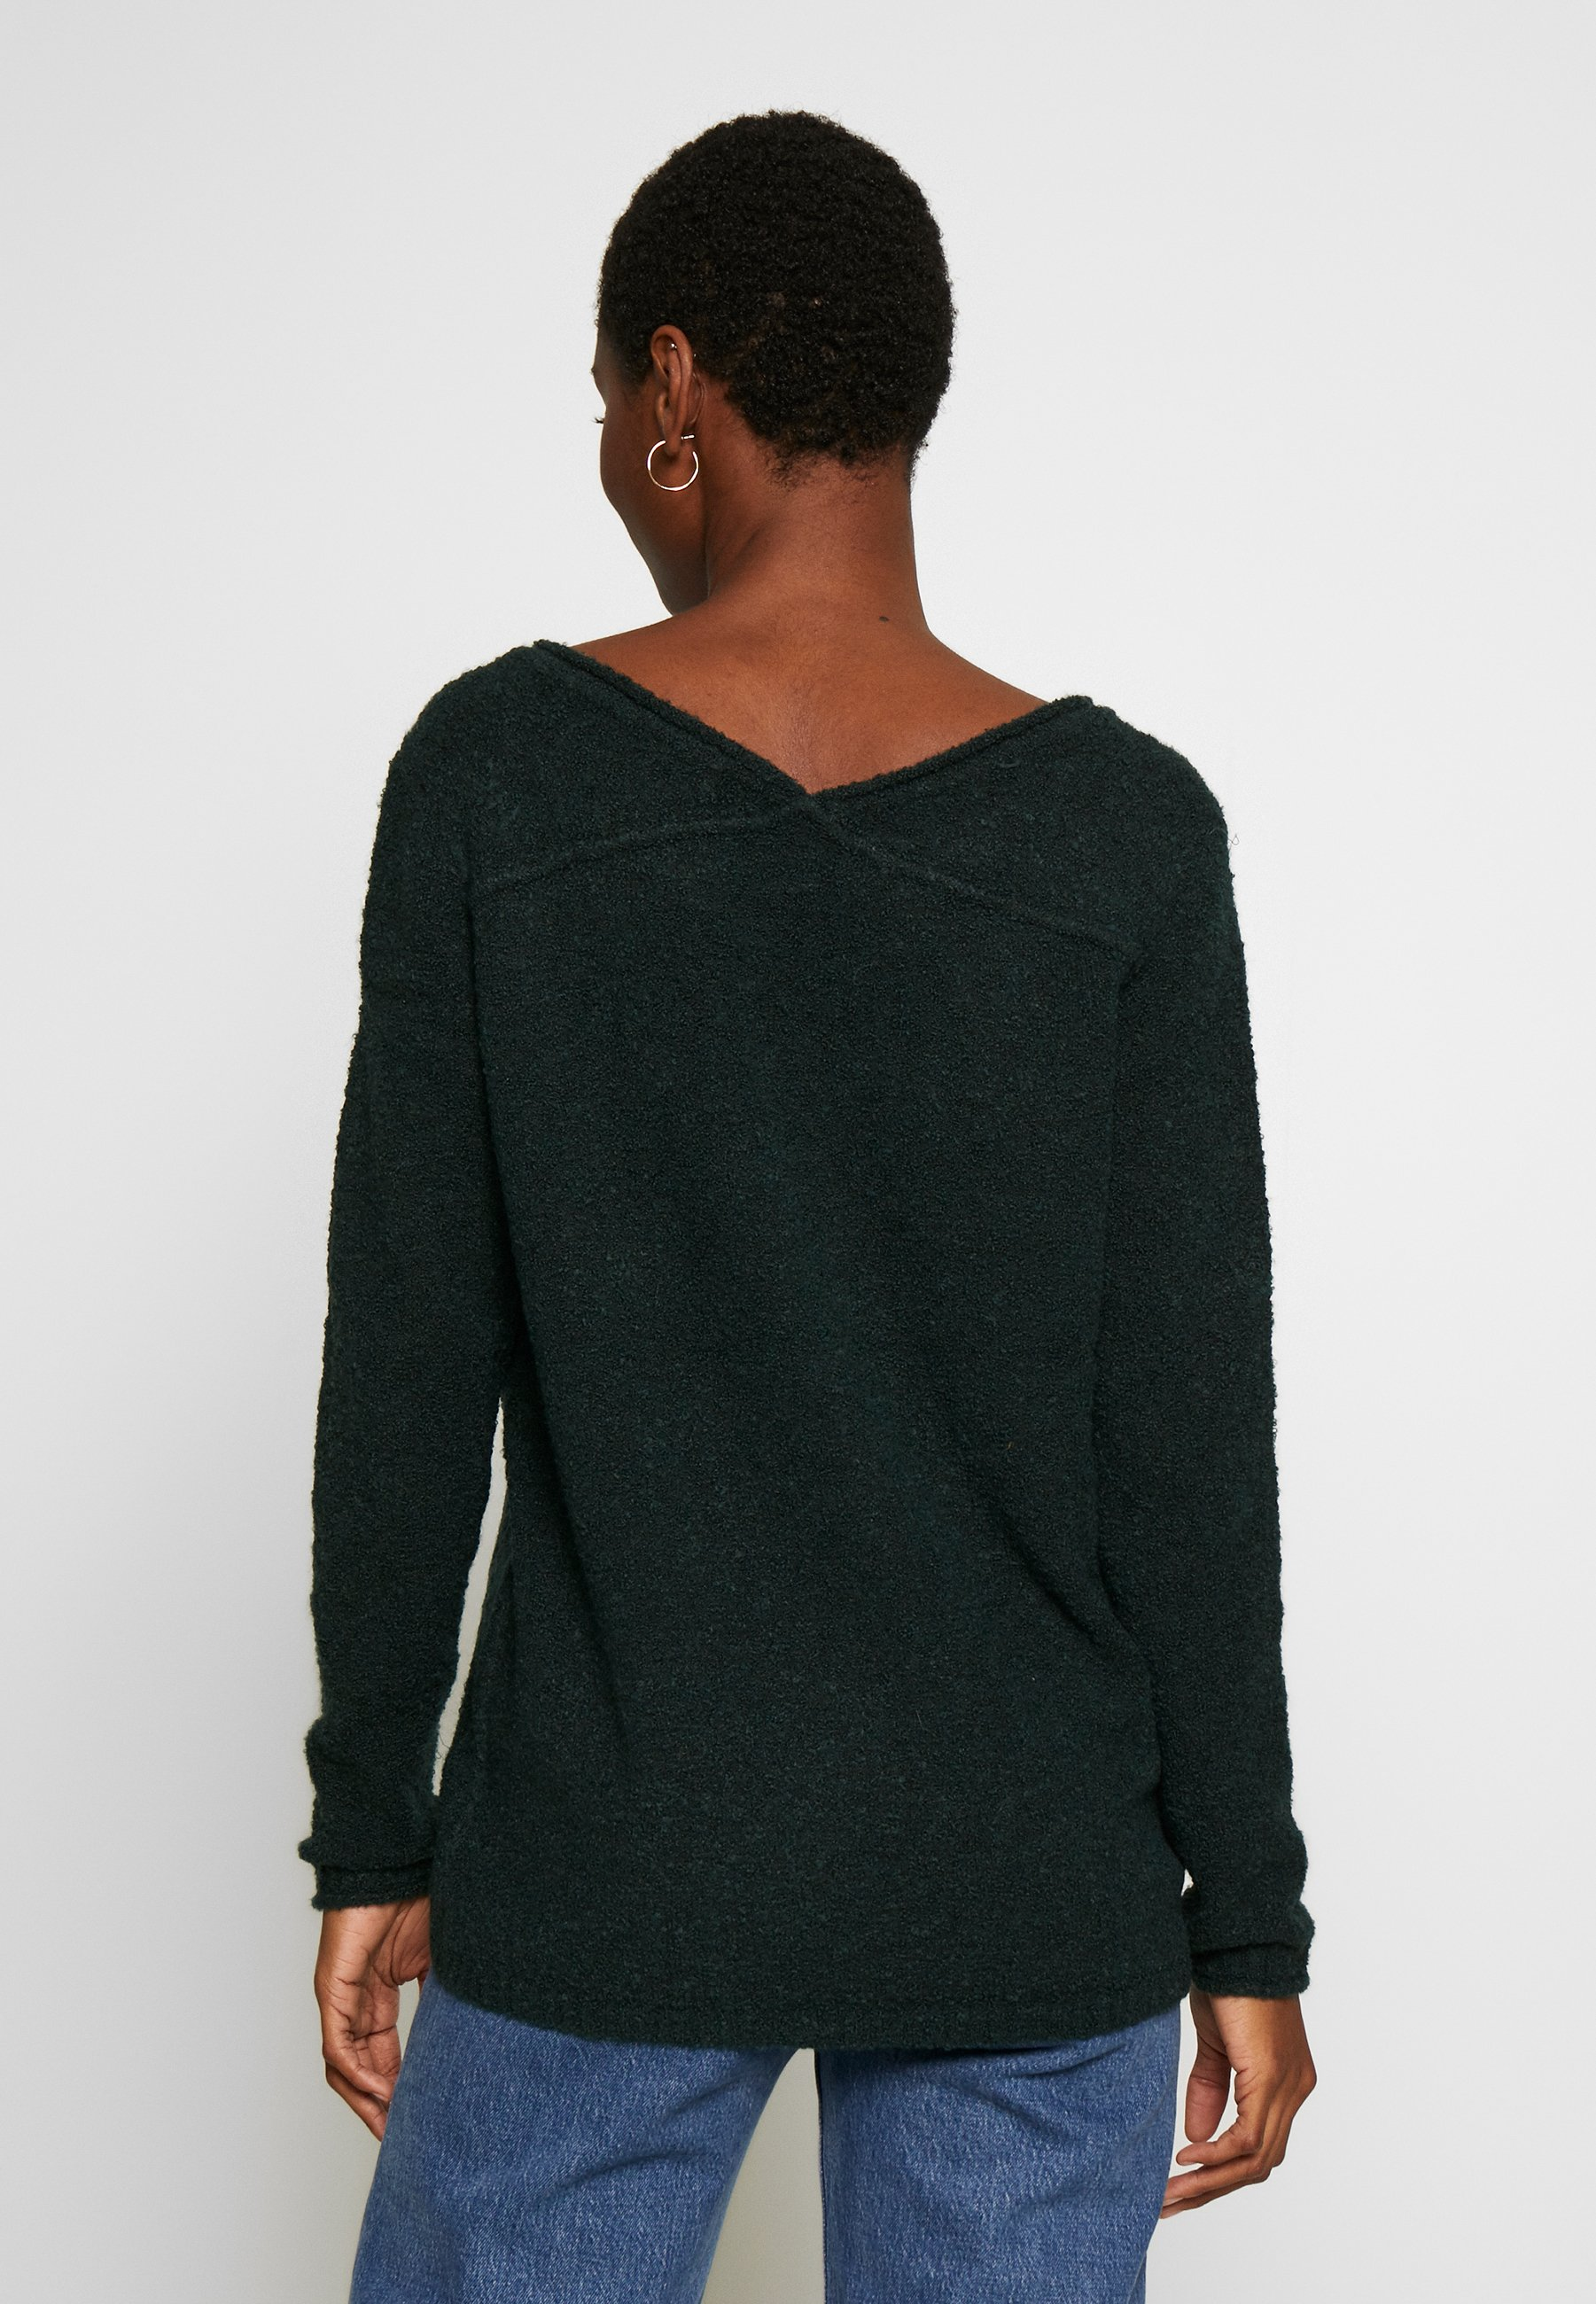 Esprit Sweter - dark teal green